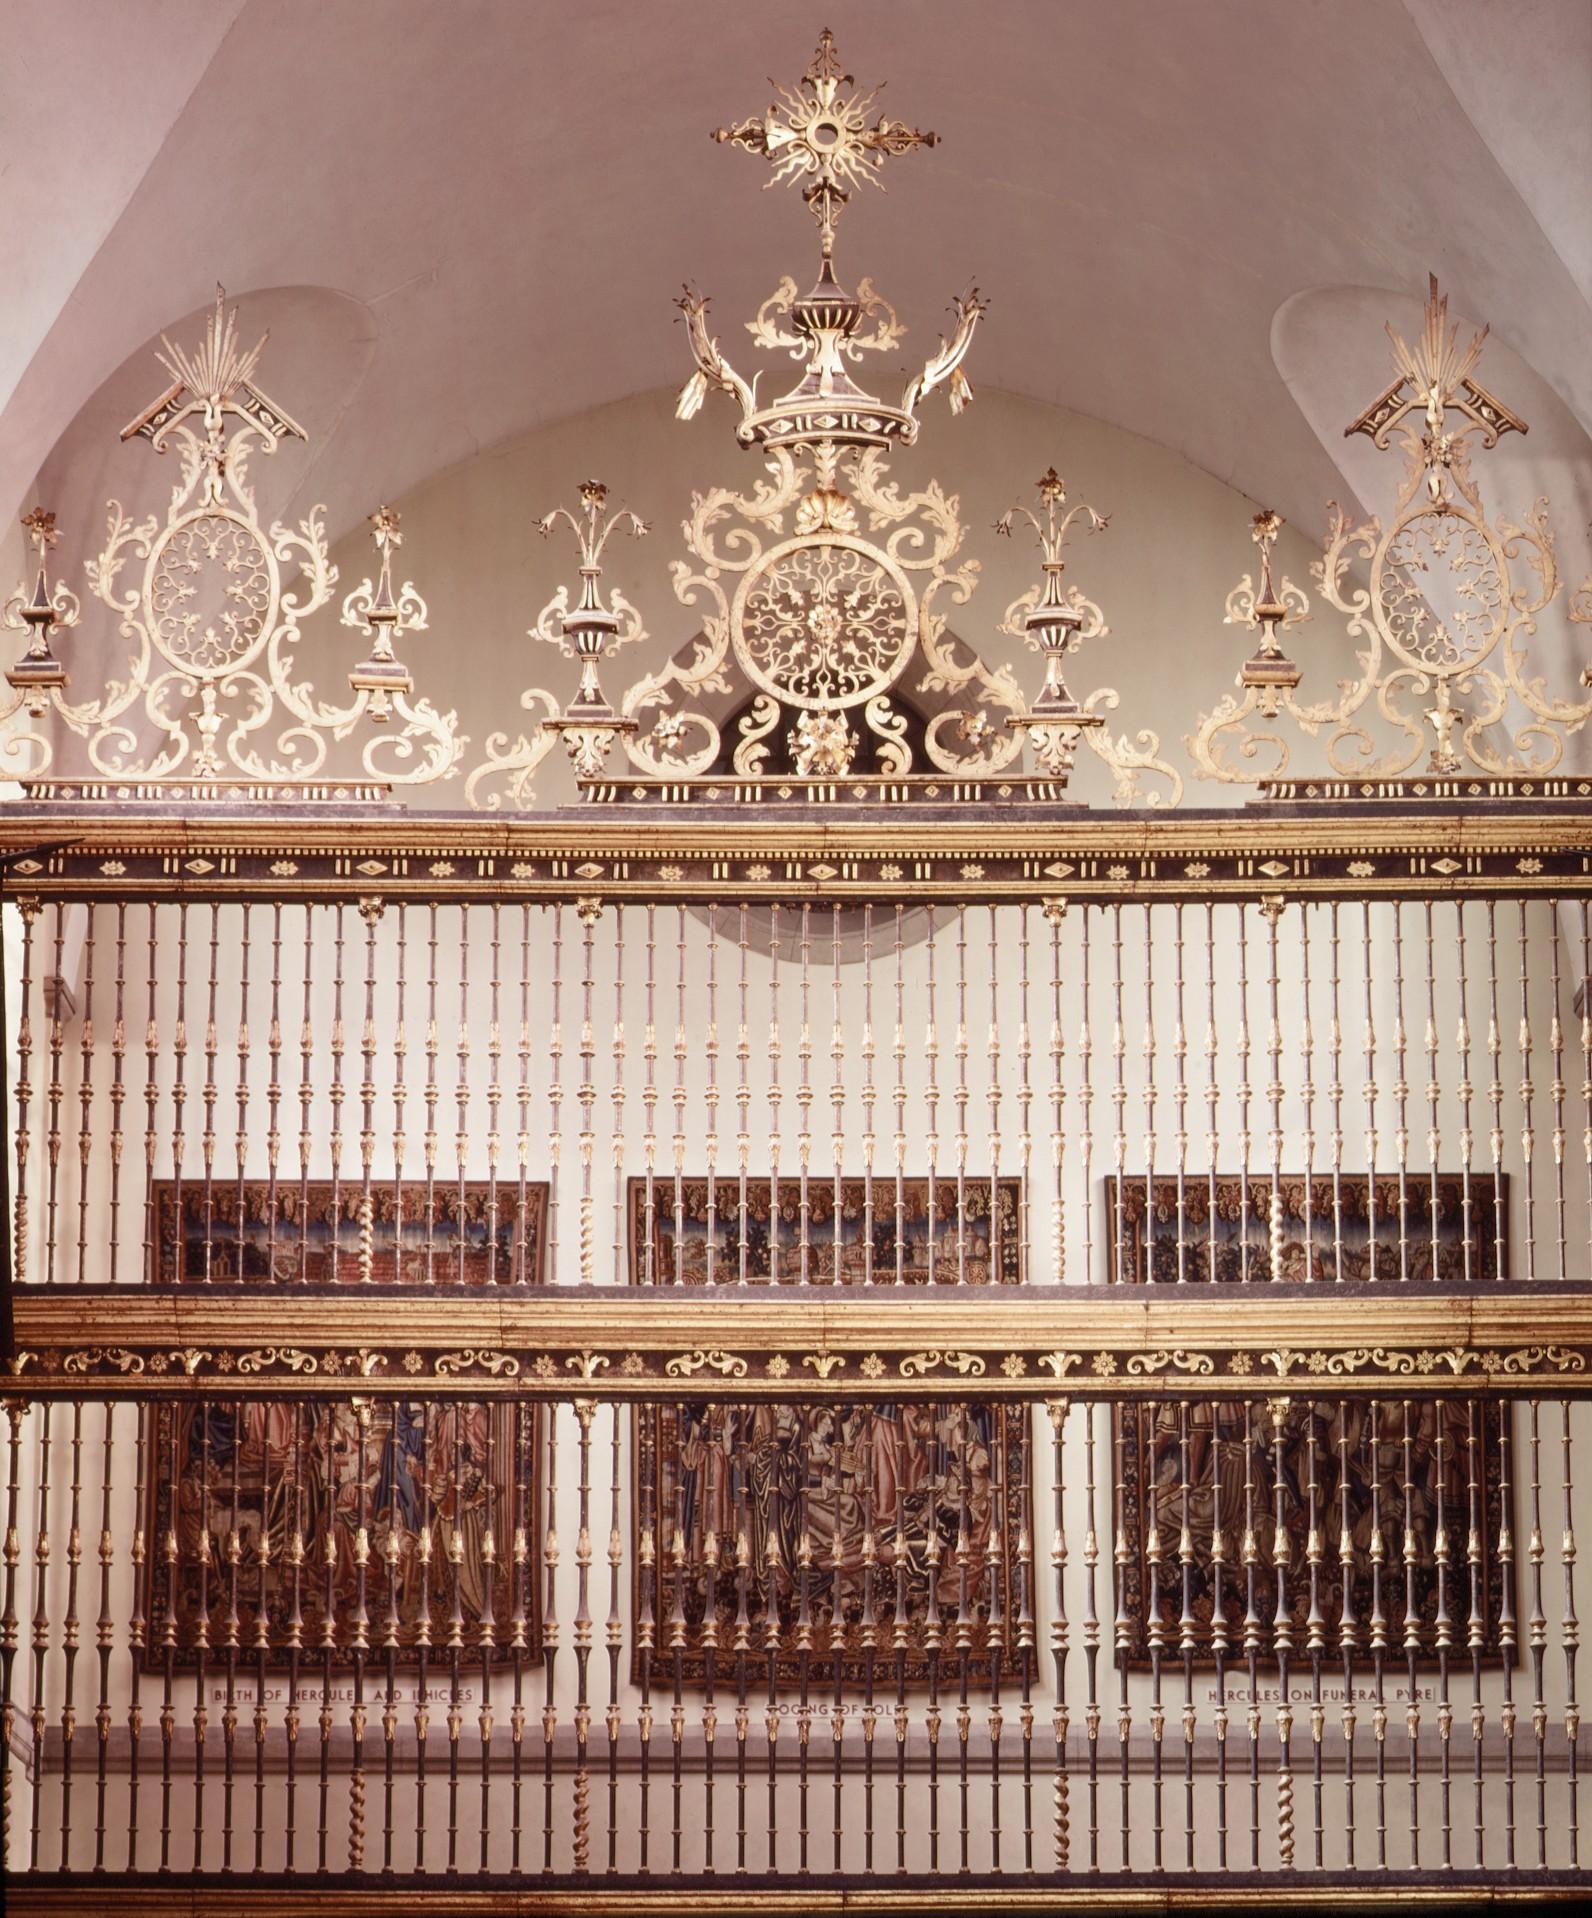 https://images.metmuseum.org/CRDImages/es/original/ES4661.jpg